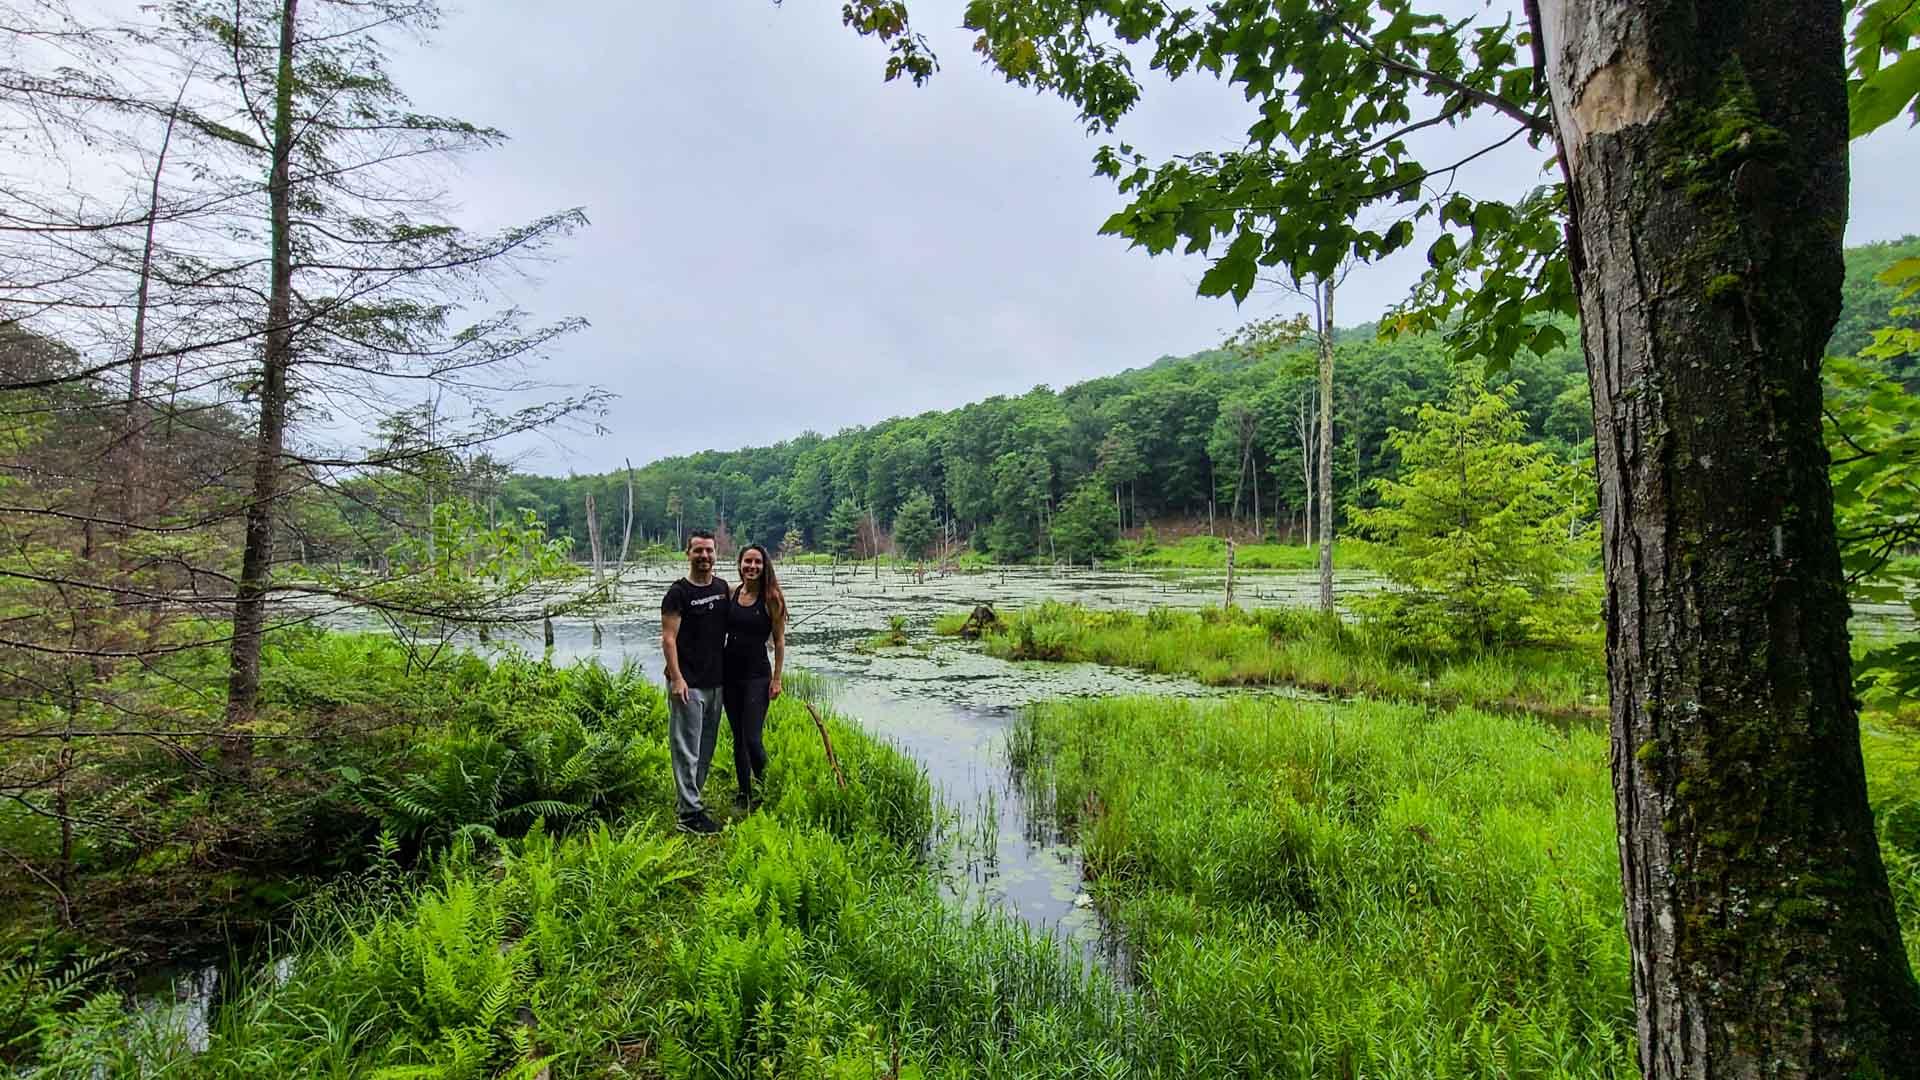 Lago de nenúfares, Corinth Reservoir Recreation Area, Adirondack, Nueva York